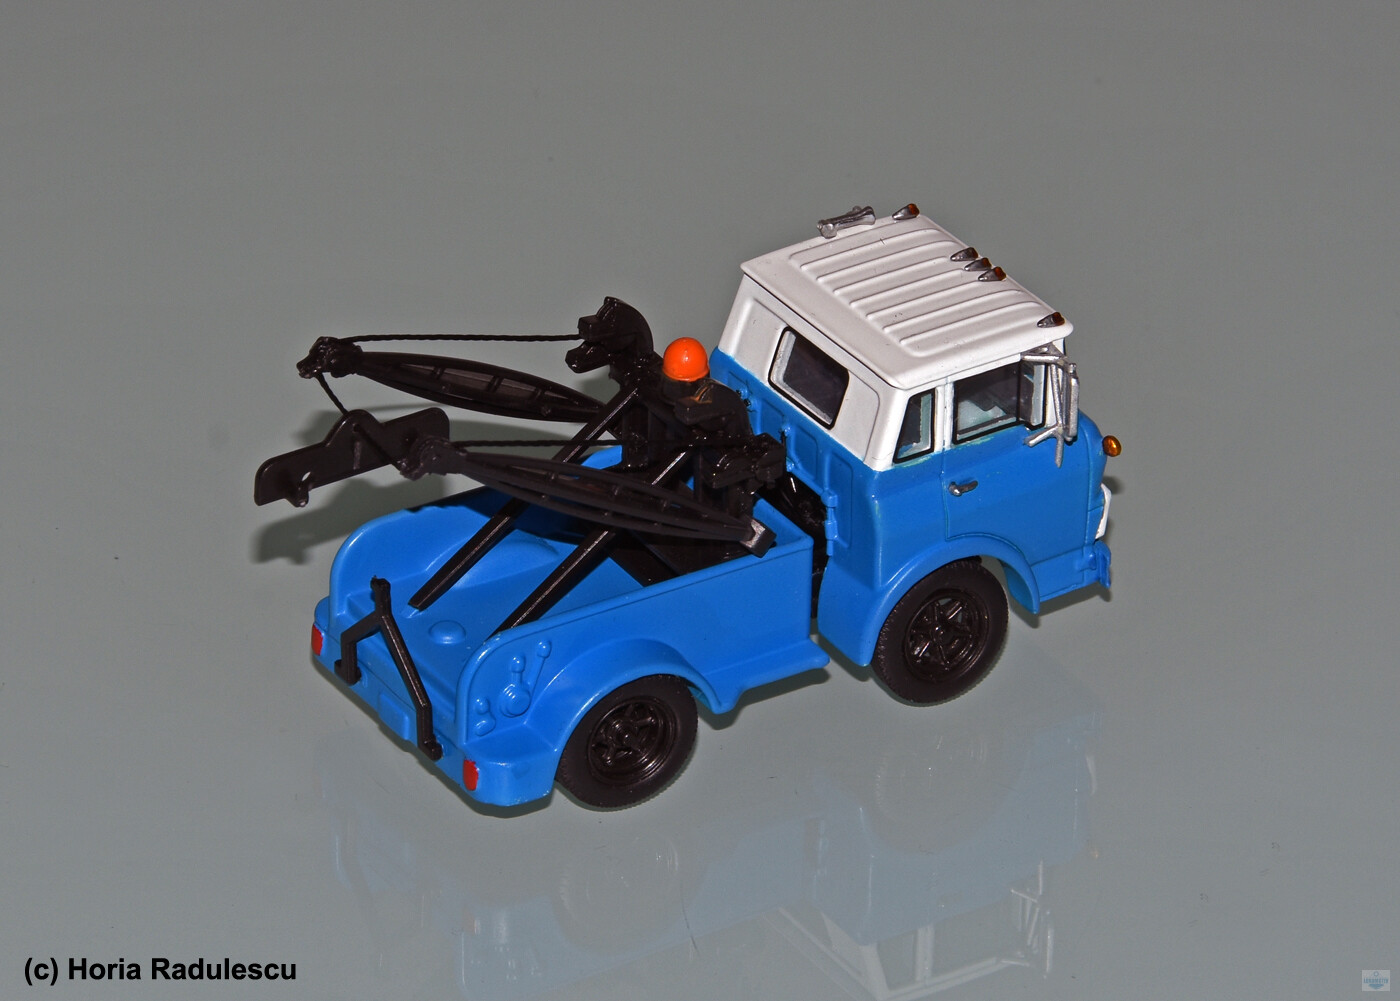 64-NYPD-MTD-Chevrolet-Umbau-HR-2.jpg